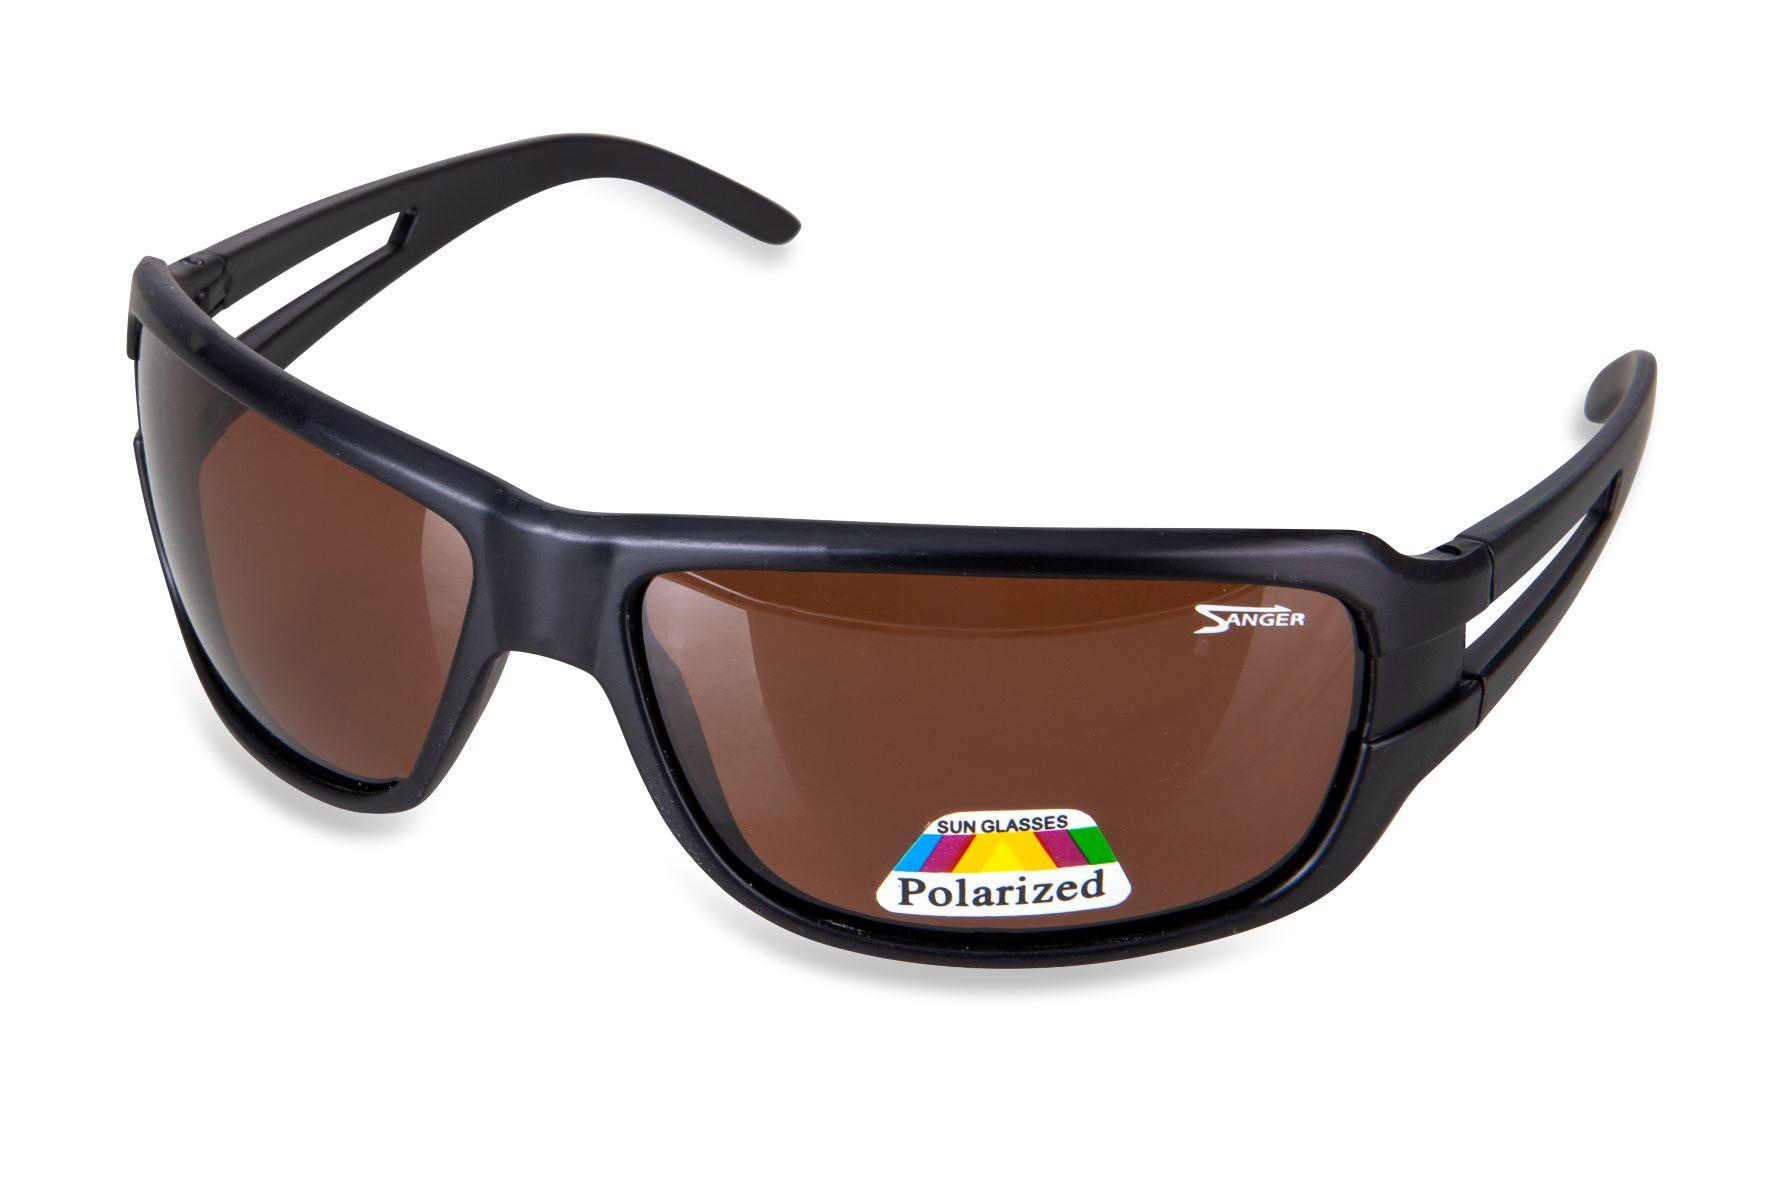 Brýle proti slunci Pol-Glasses 2 varianta: jantar